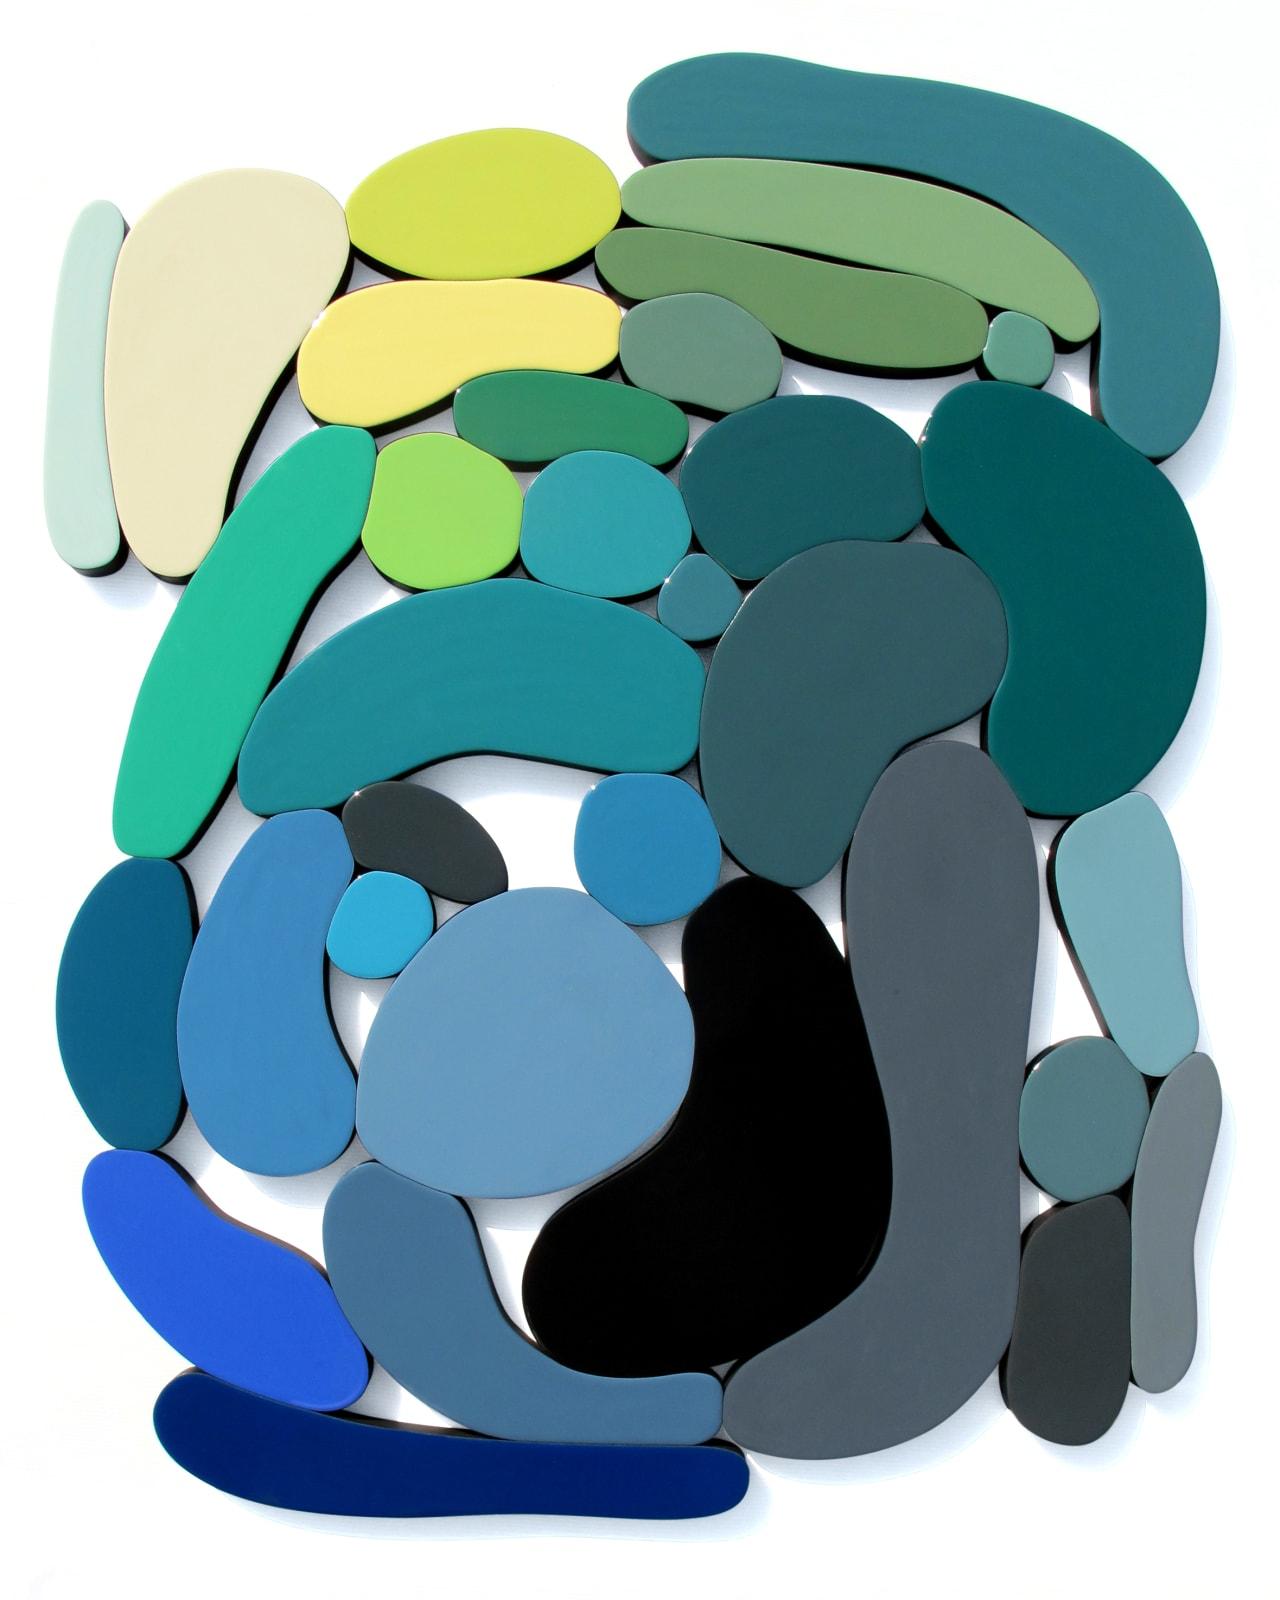 Klari Reis, Cluster, 2020